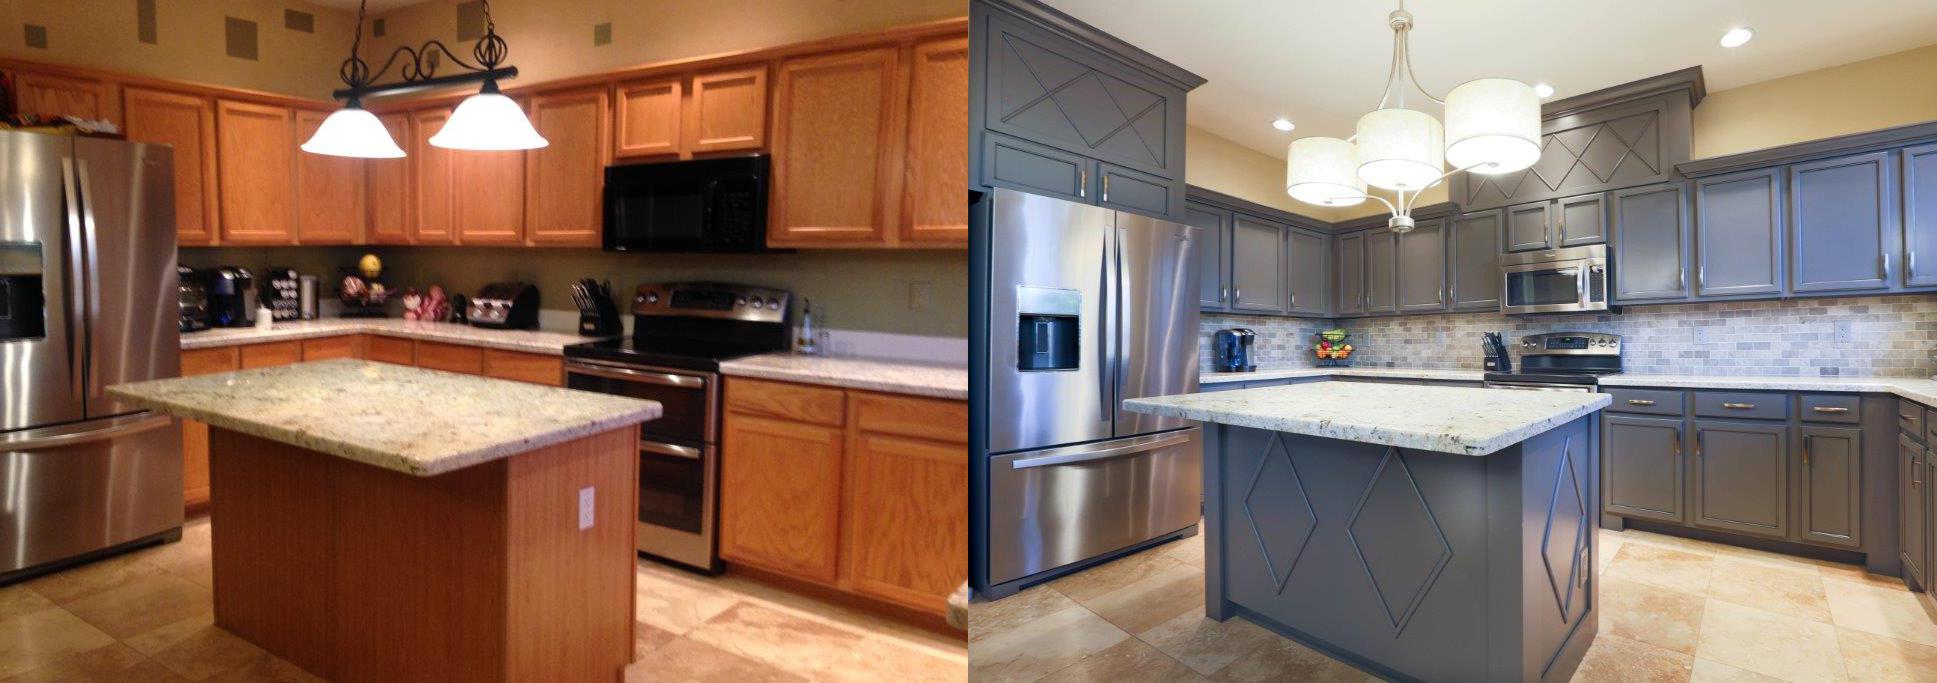 cabinet refinishing refinish kitchen cabinets kitchen cabinets refinished 6